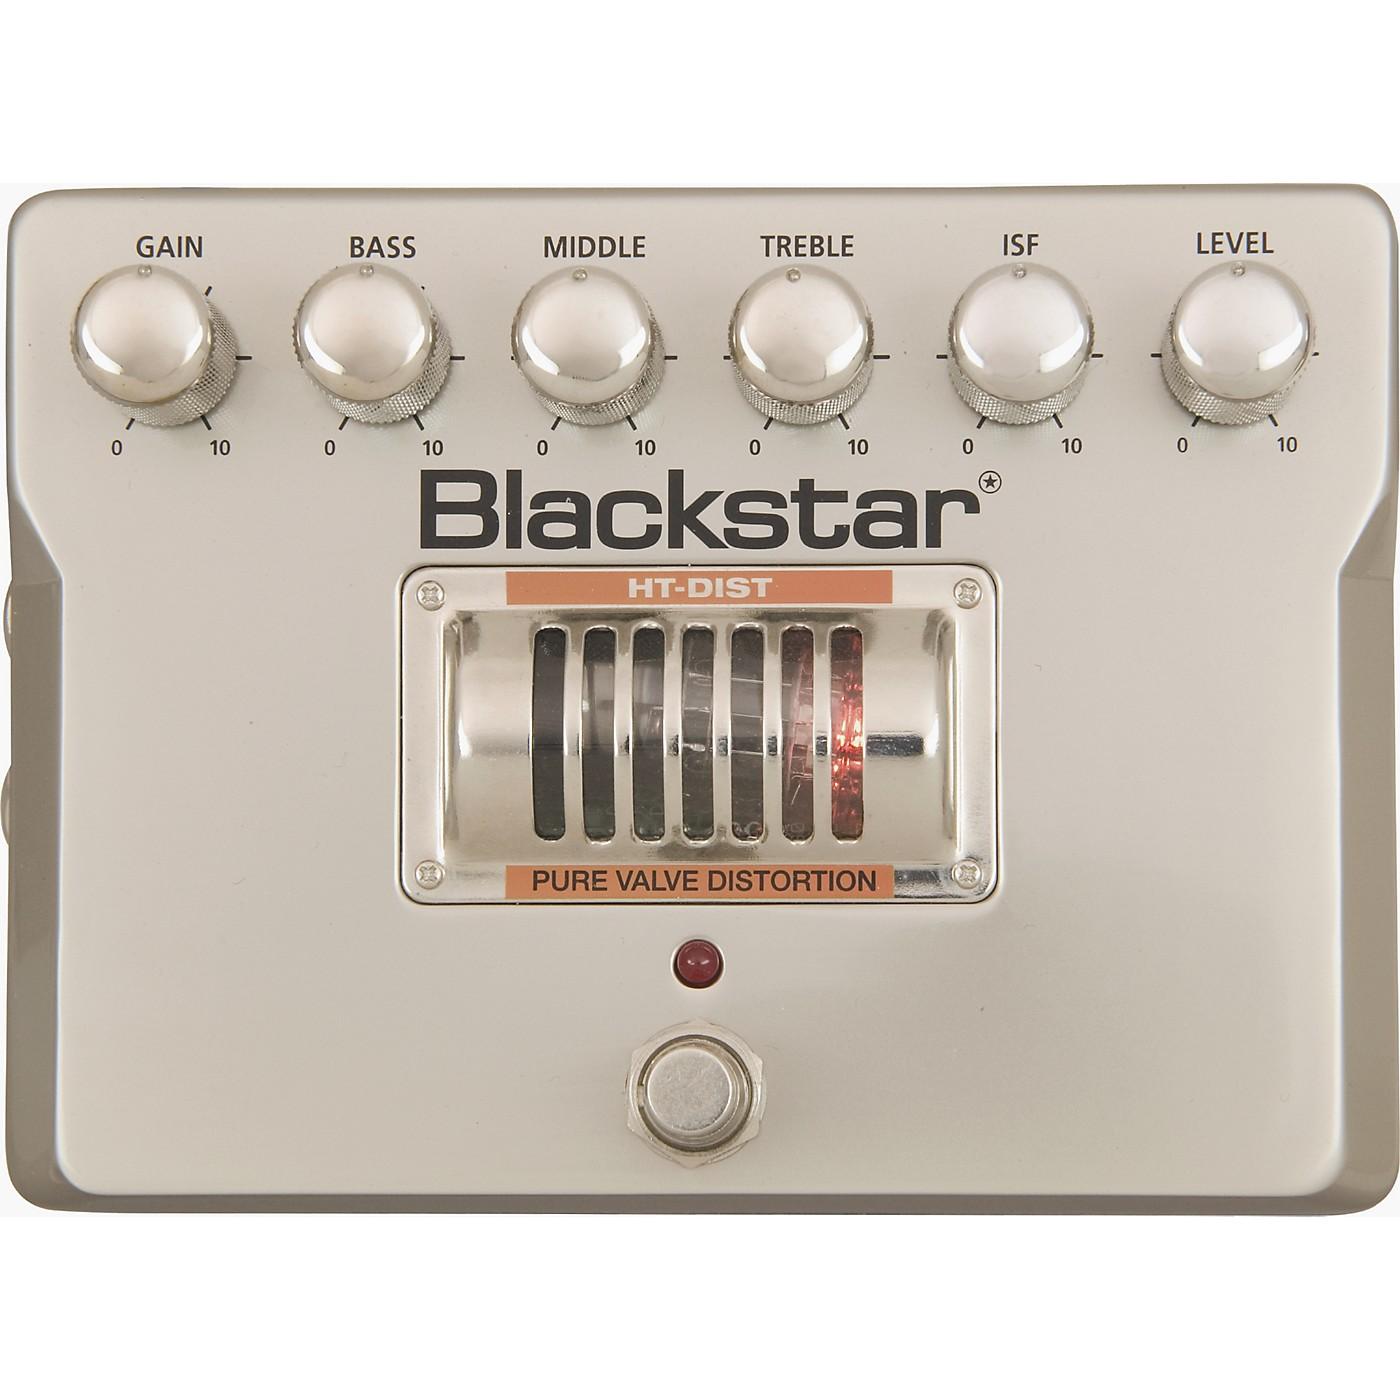 Blackstar HT Series HT-DIST Tube Distortion Guitar Effects Pedal thumbnail